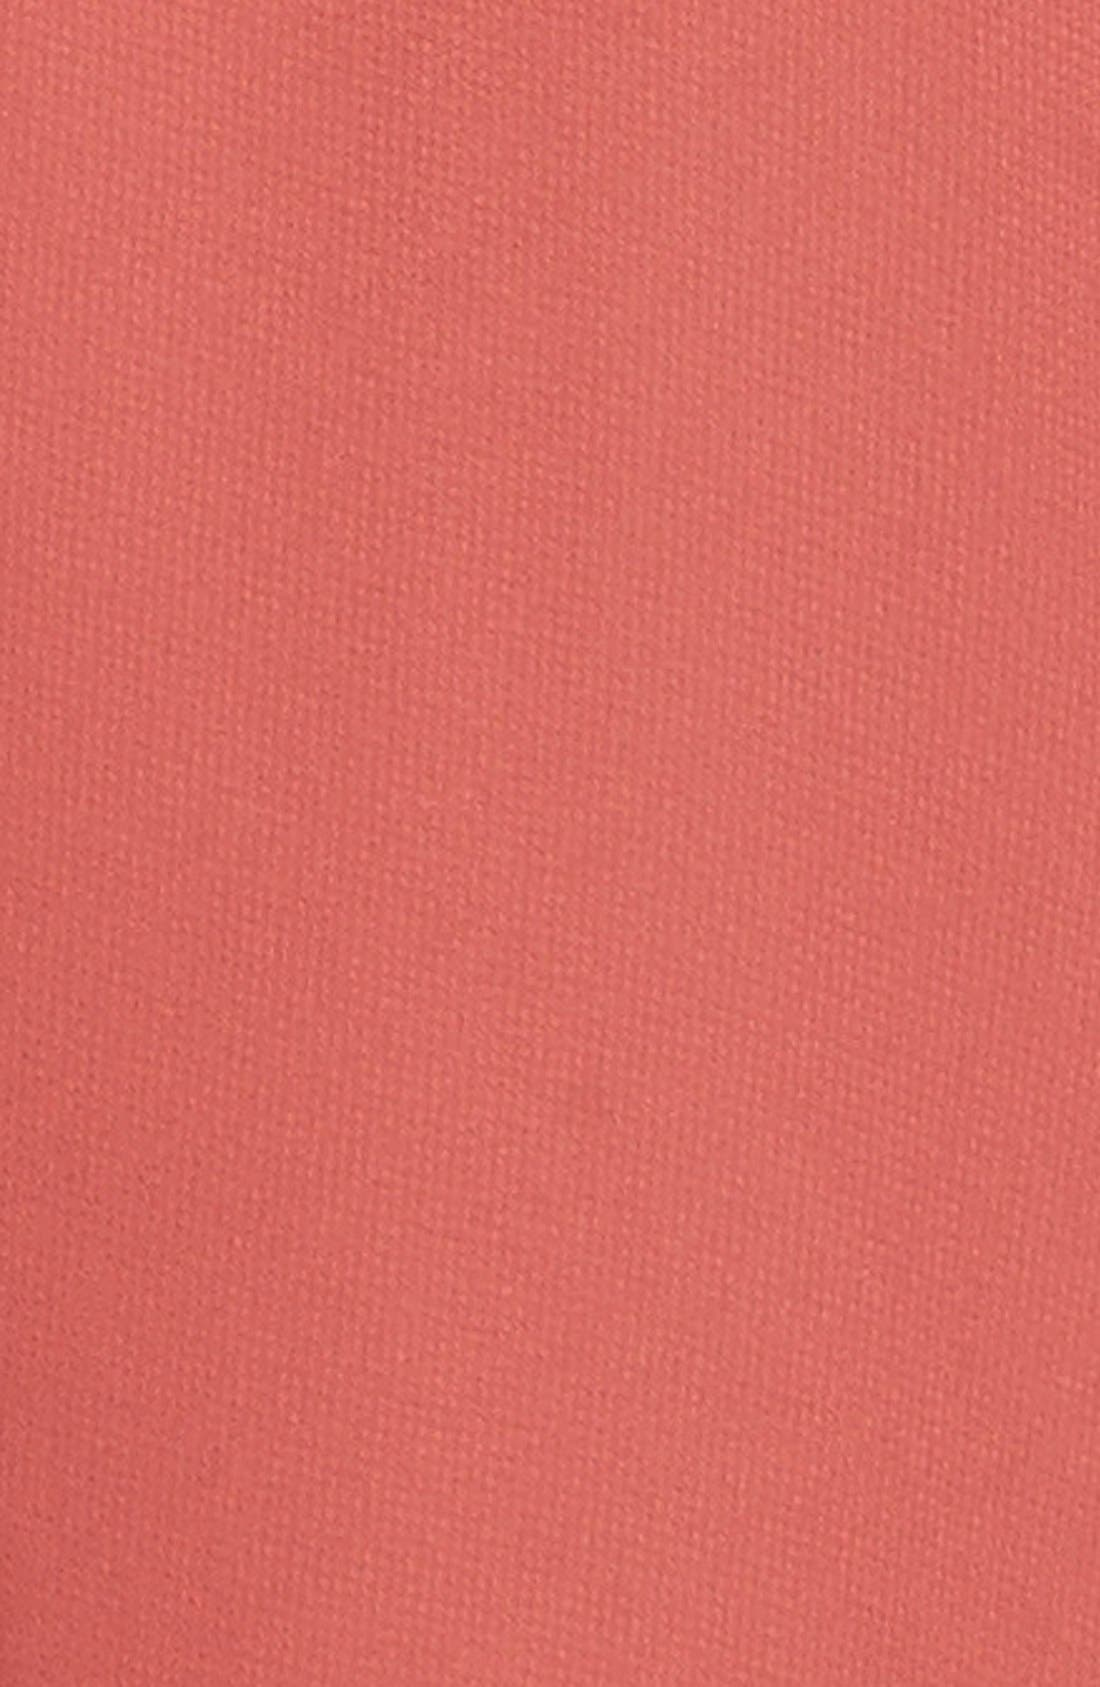 Blouson Chiffon Skater Dress,                             Alternate thumbnail 190, color,